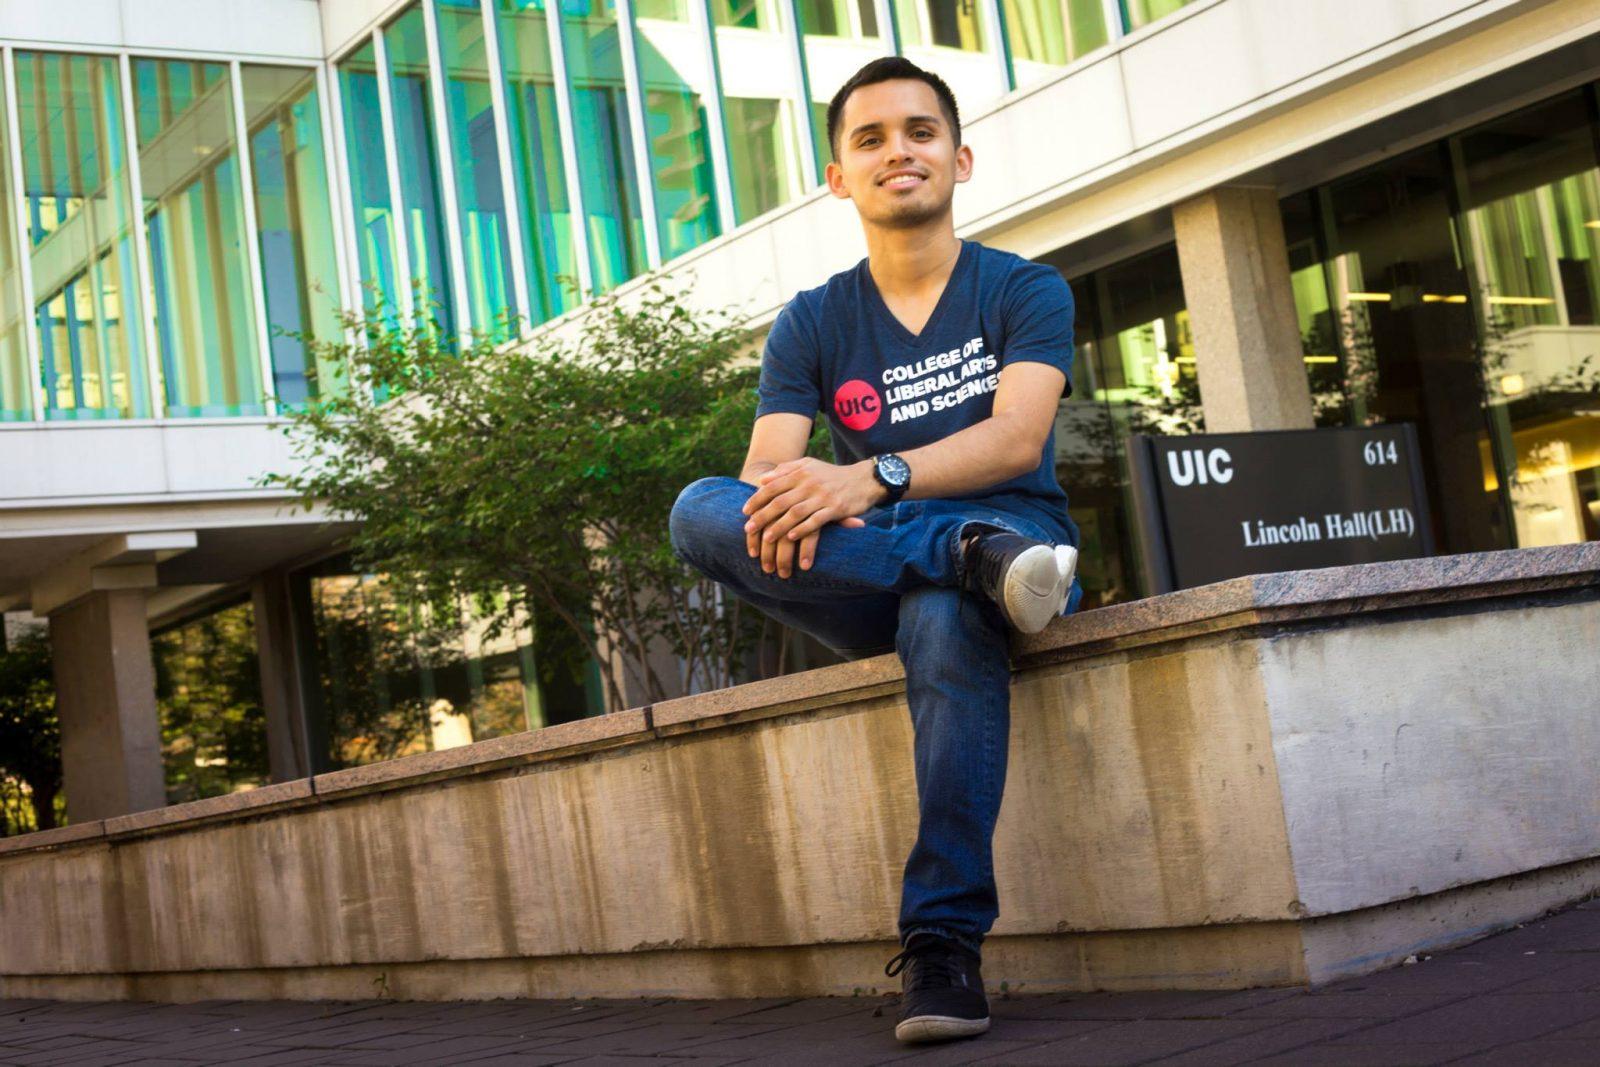 HEAR Graduate Scholar Carlos Montero at his home campus at UIC